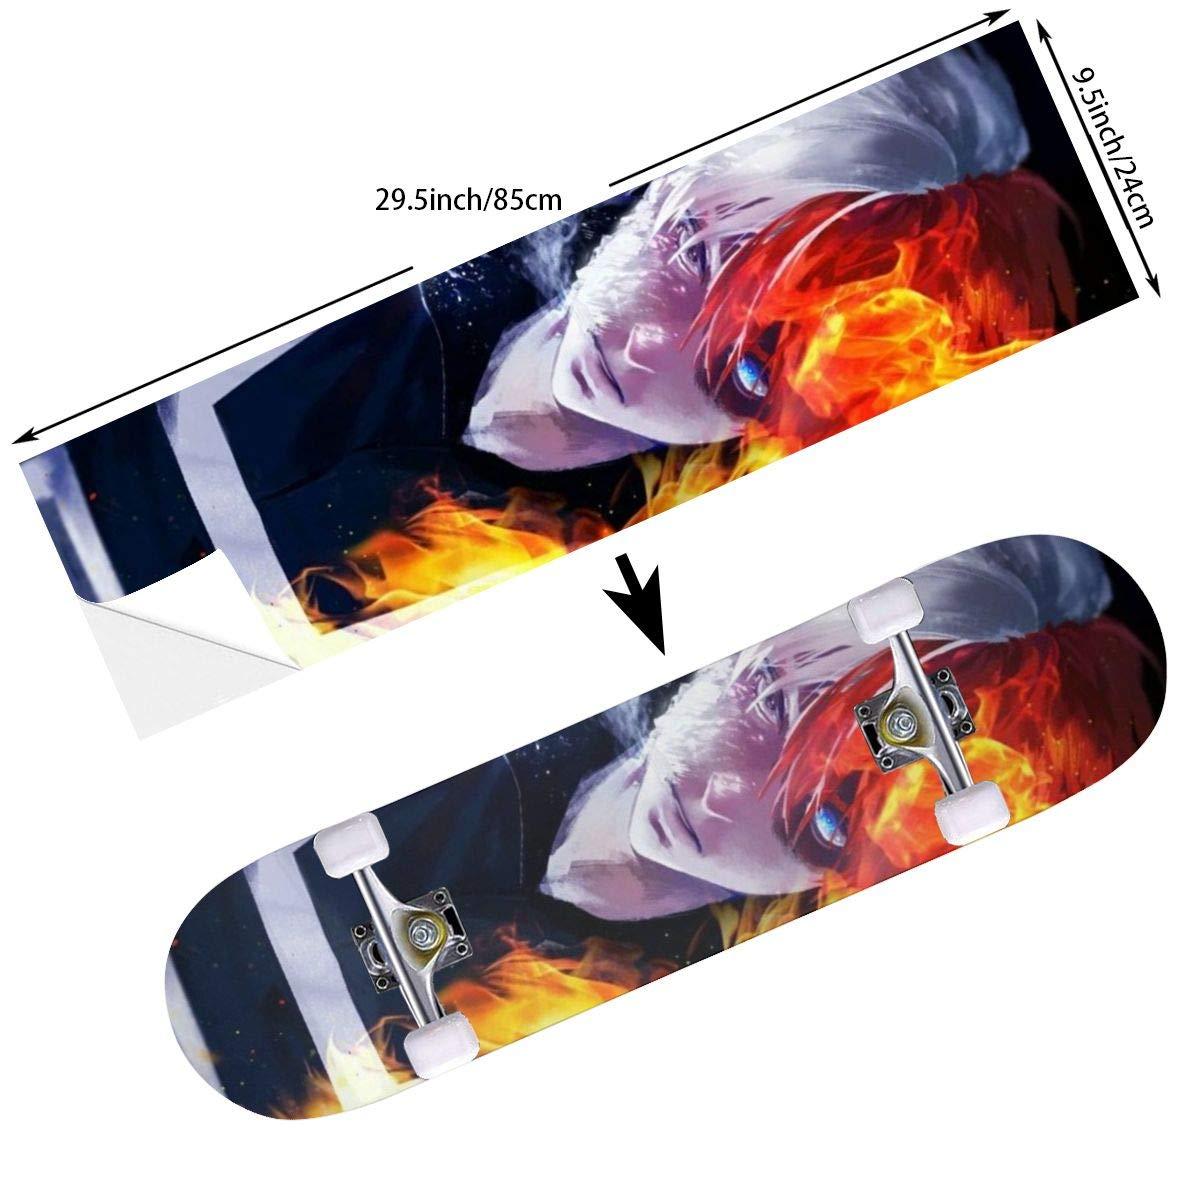 COMEBACKAGAIN Skateboard Cruiser Deck and Balance Board Stickers Decals 9.5 x 33.5 Inches